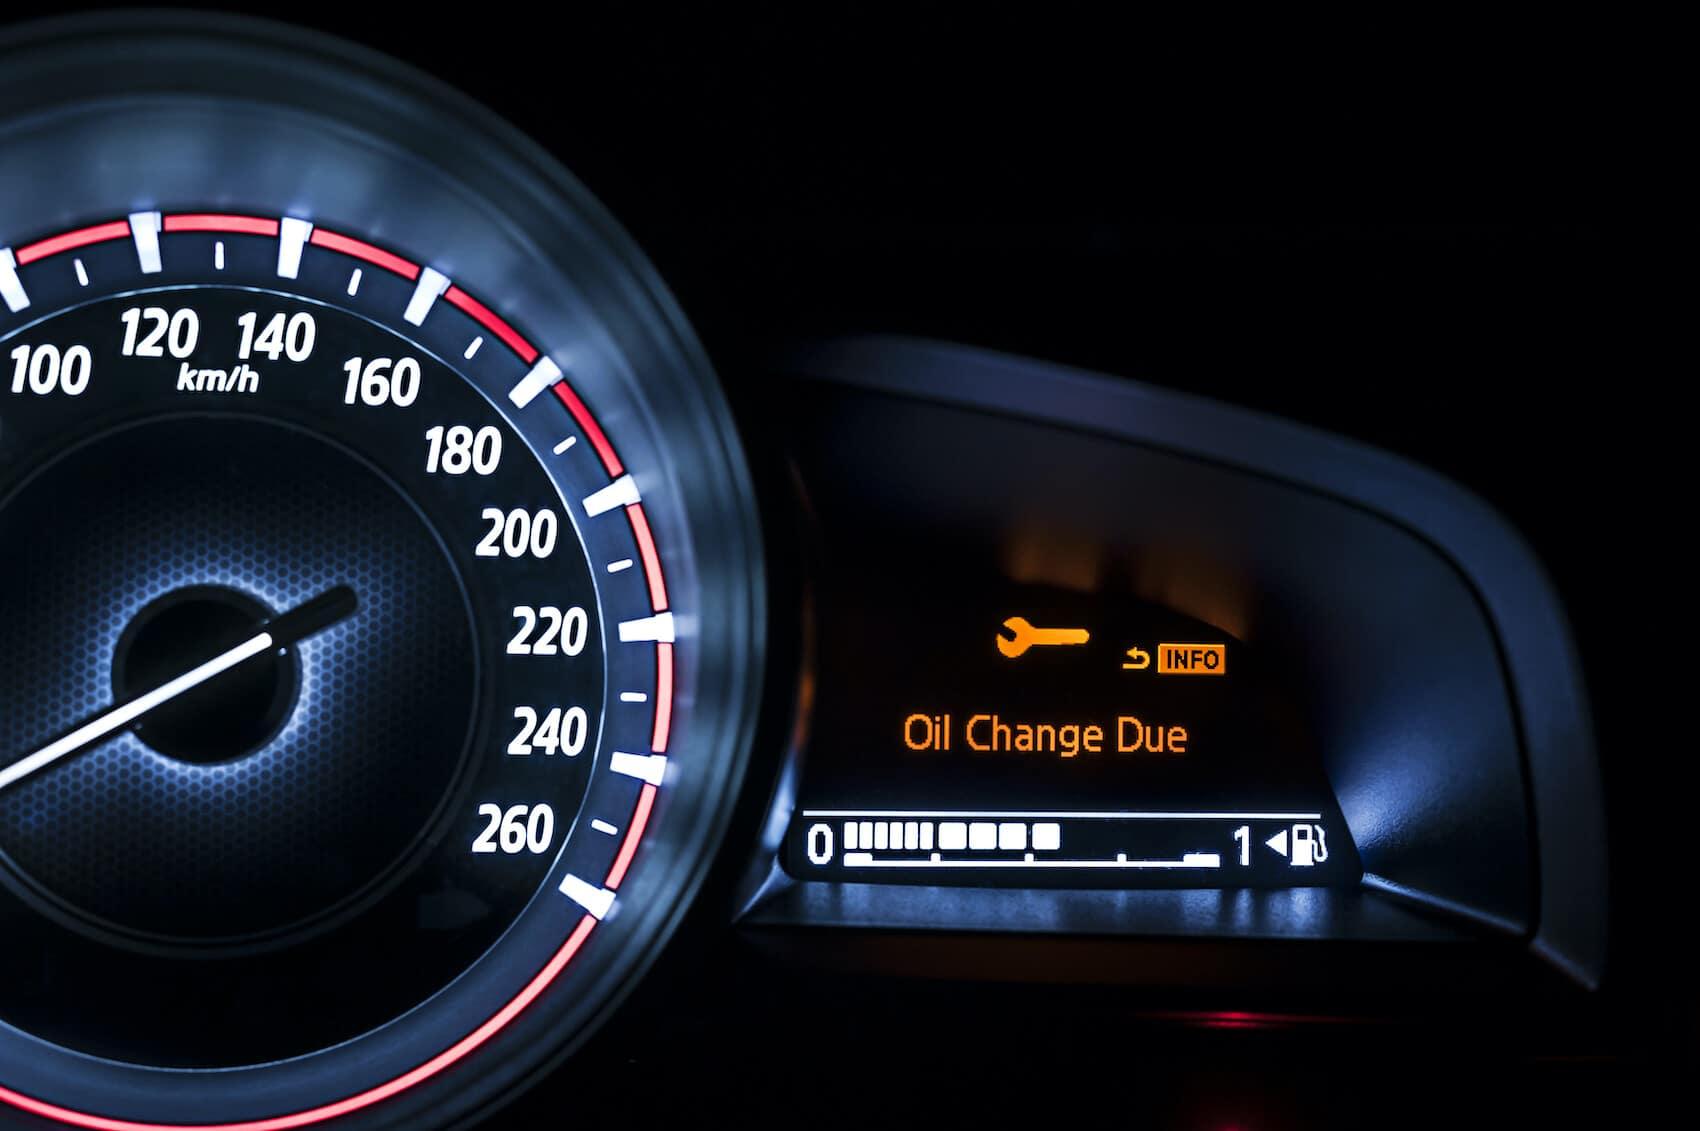 MINI Cooper Oil Change Mileage near Upper East Side NY